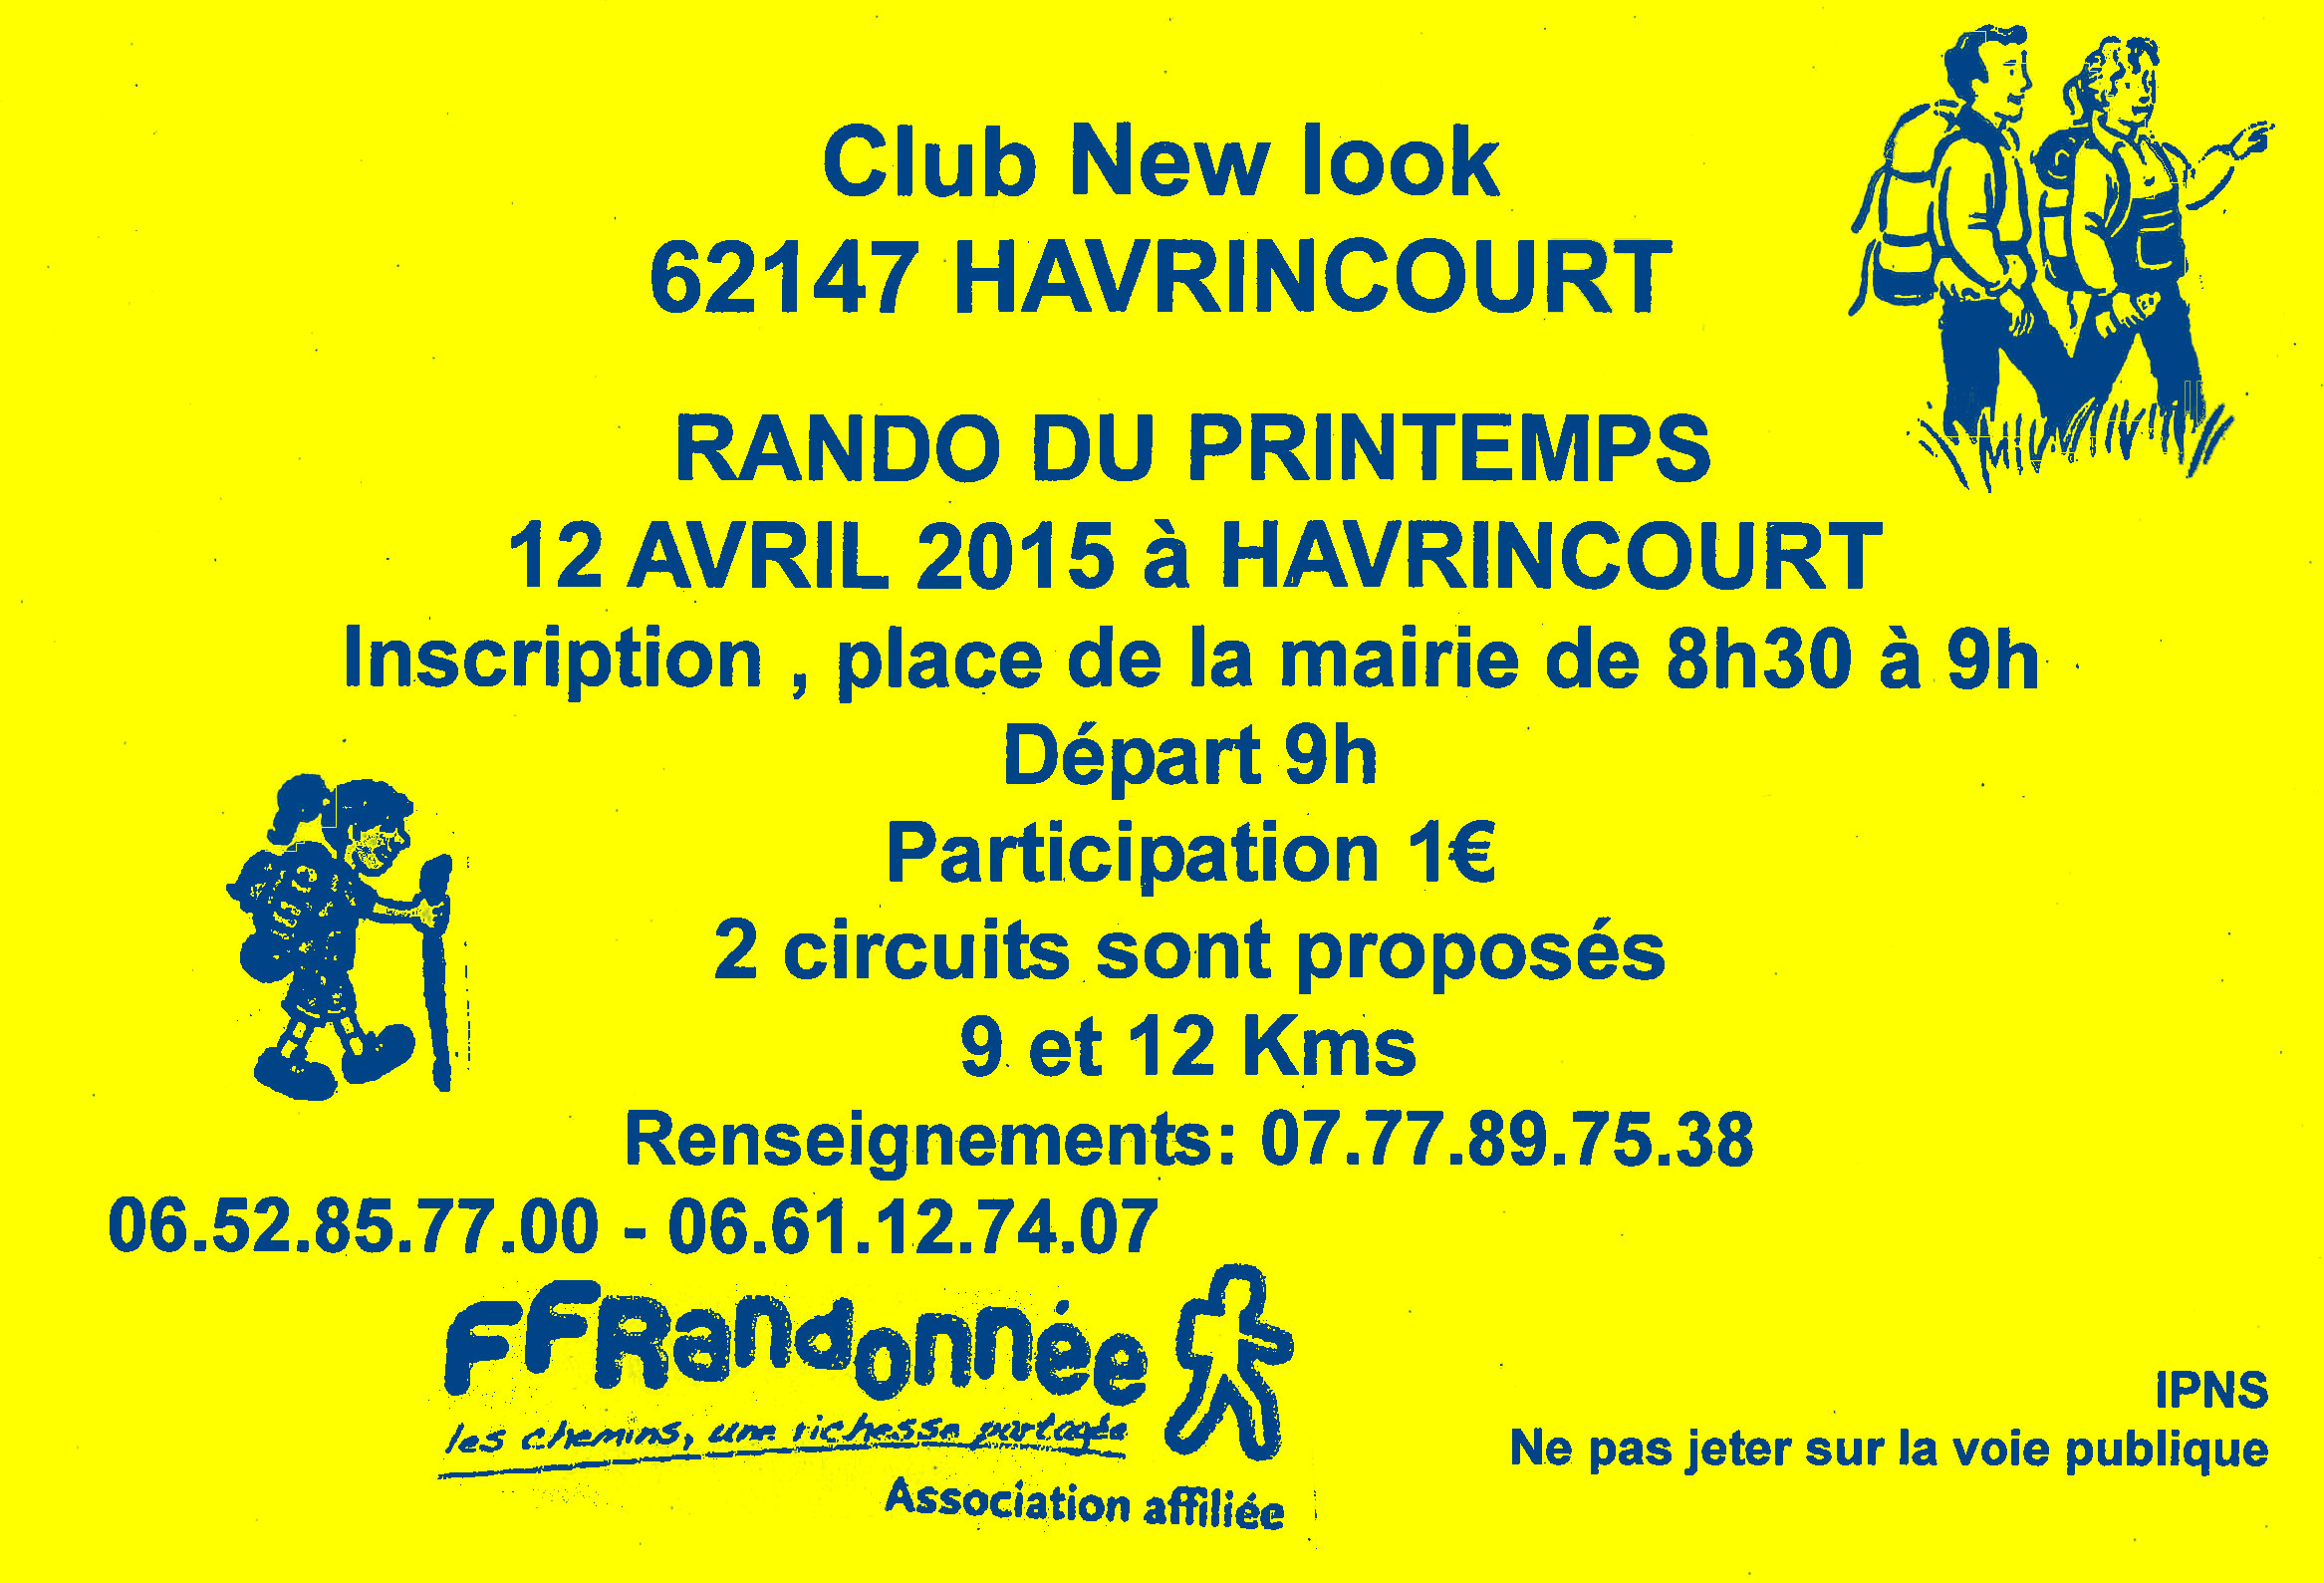 havrincourt